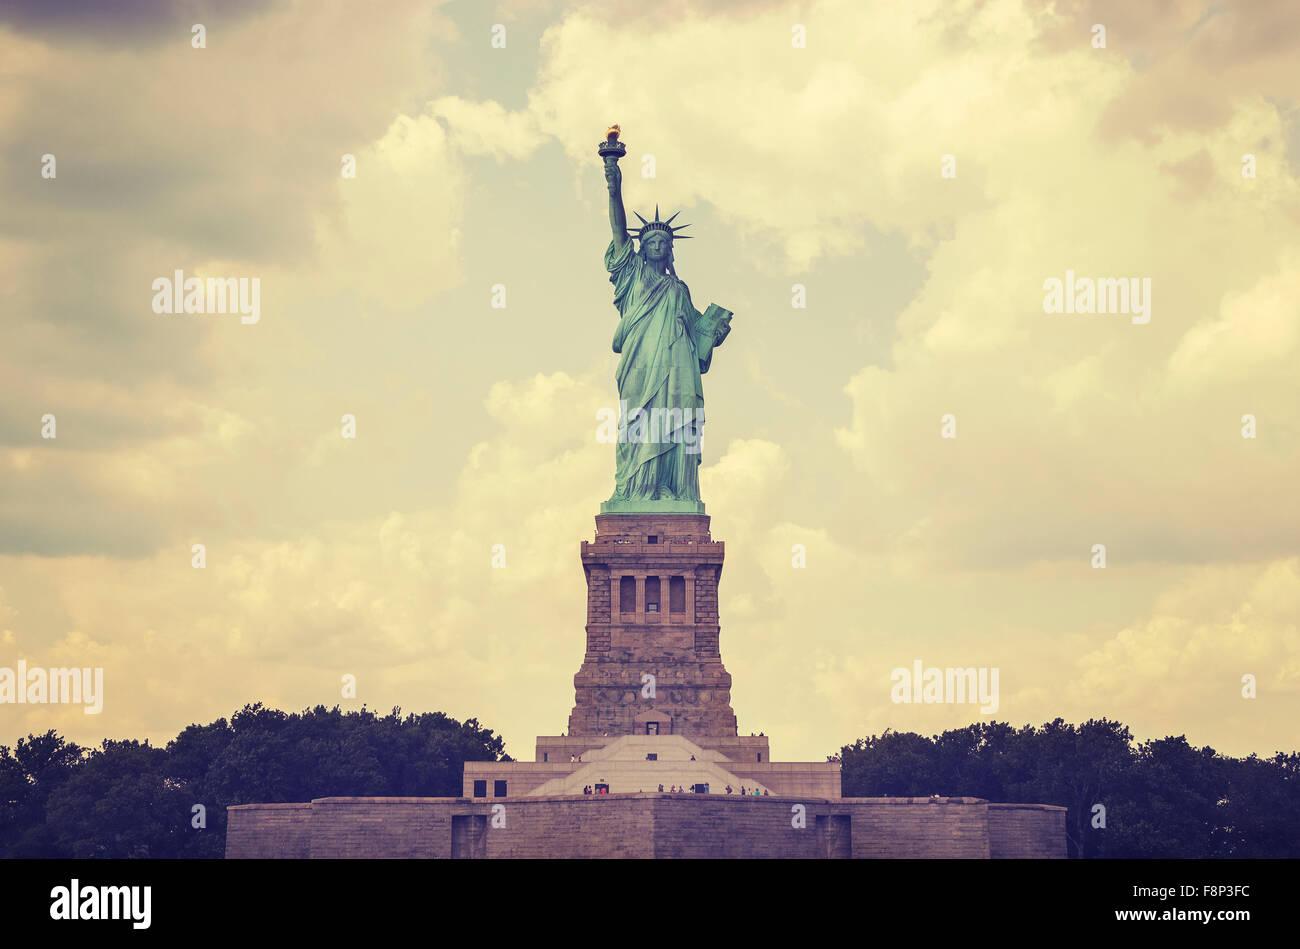 Vintage getönten Statue of Liberty, New York, USA. Stockbild